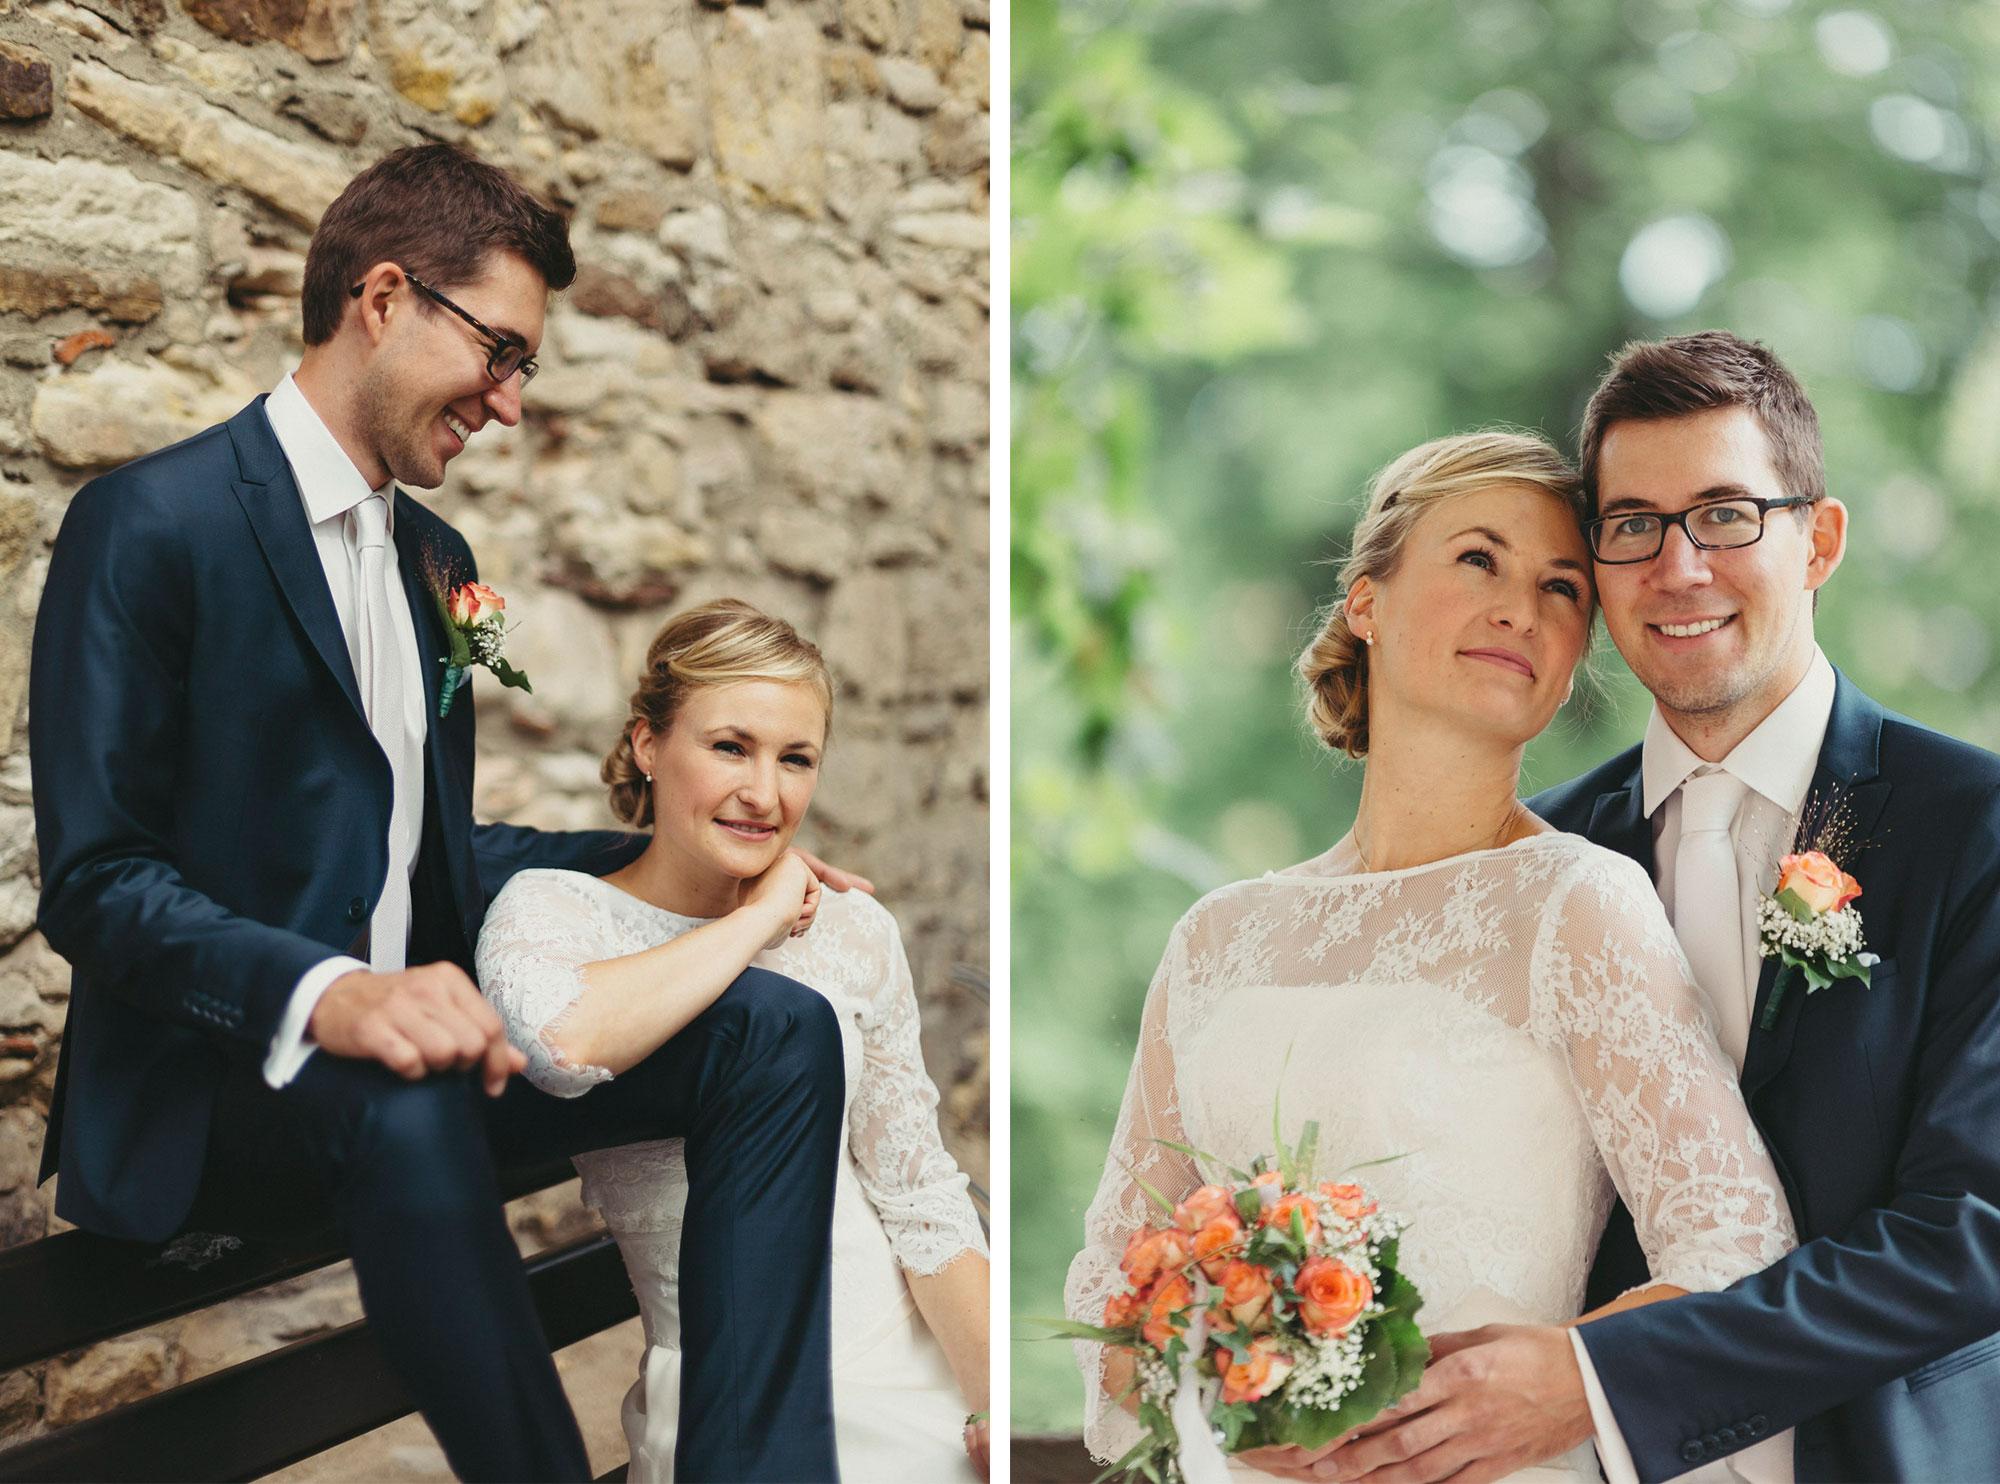 Hochzeitsfotografie-Tuebingen-Doro-Stefan-16